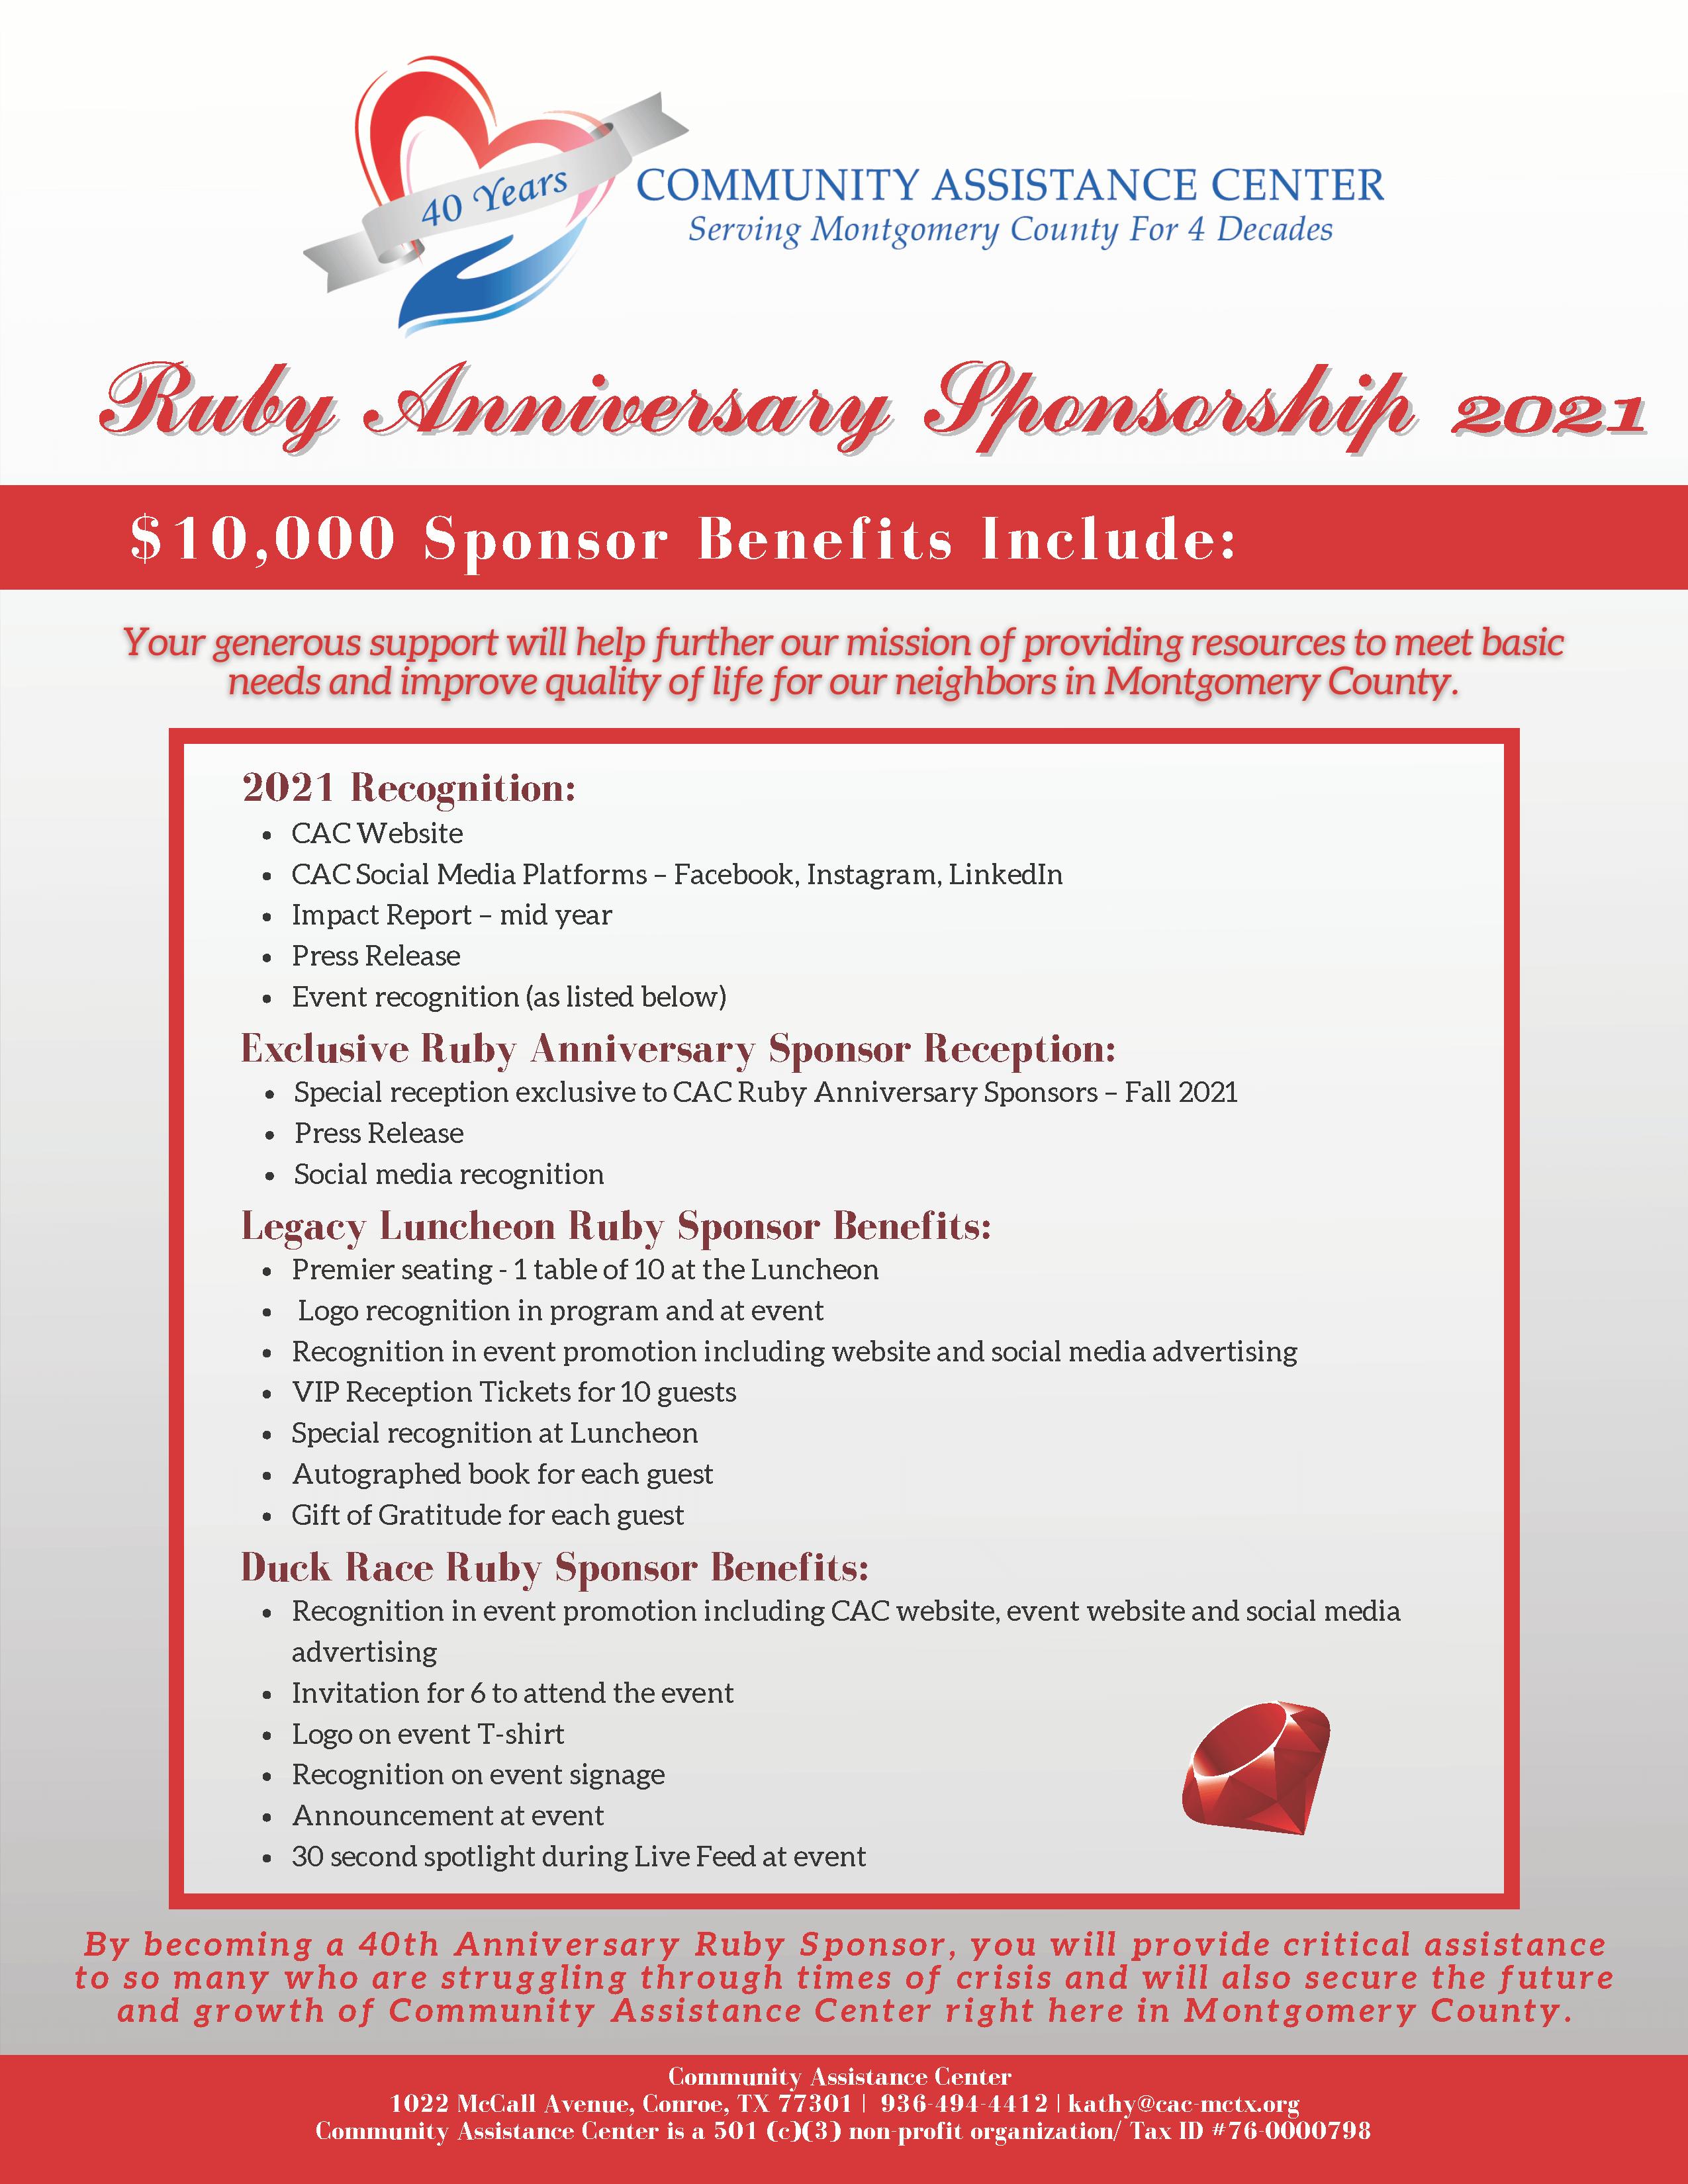 CAC Ruby Anniversary Sponsorship 2021